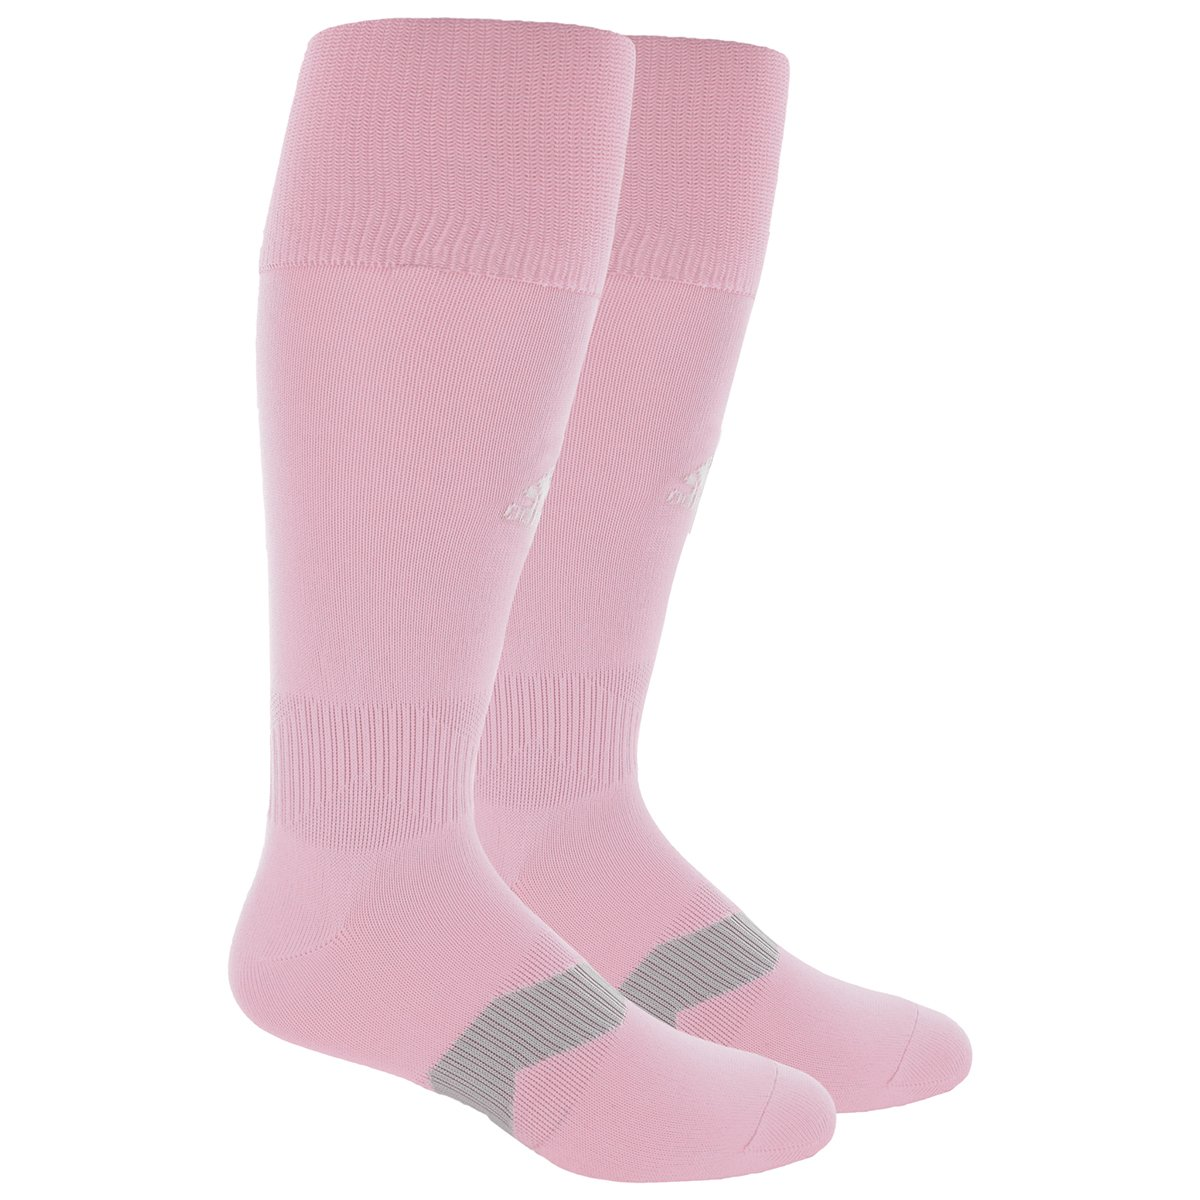 825d08743e13 Galleon - Adidas Metro IV Soccer Socks